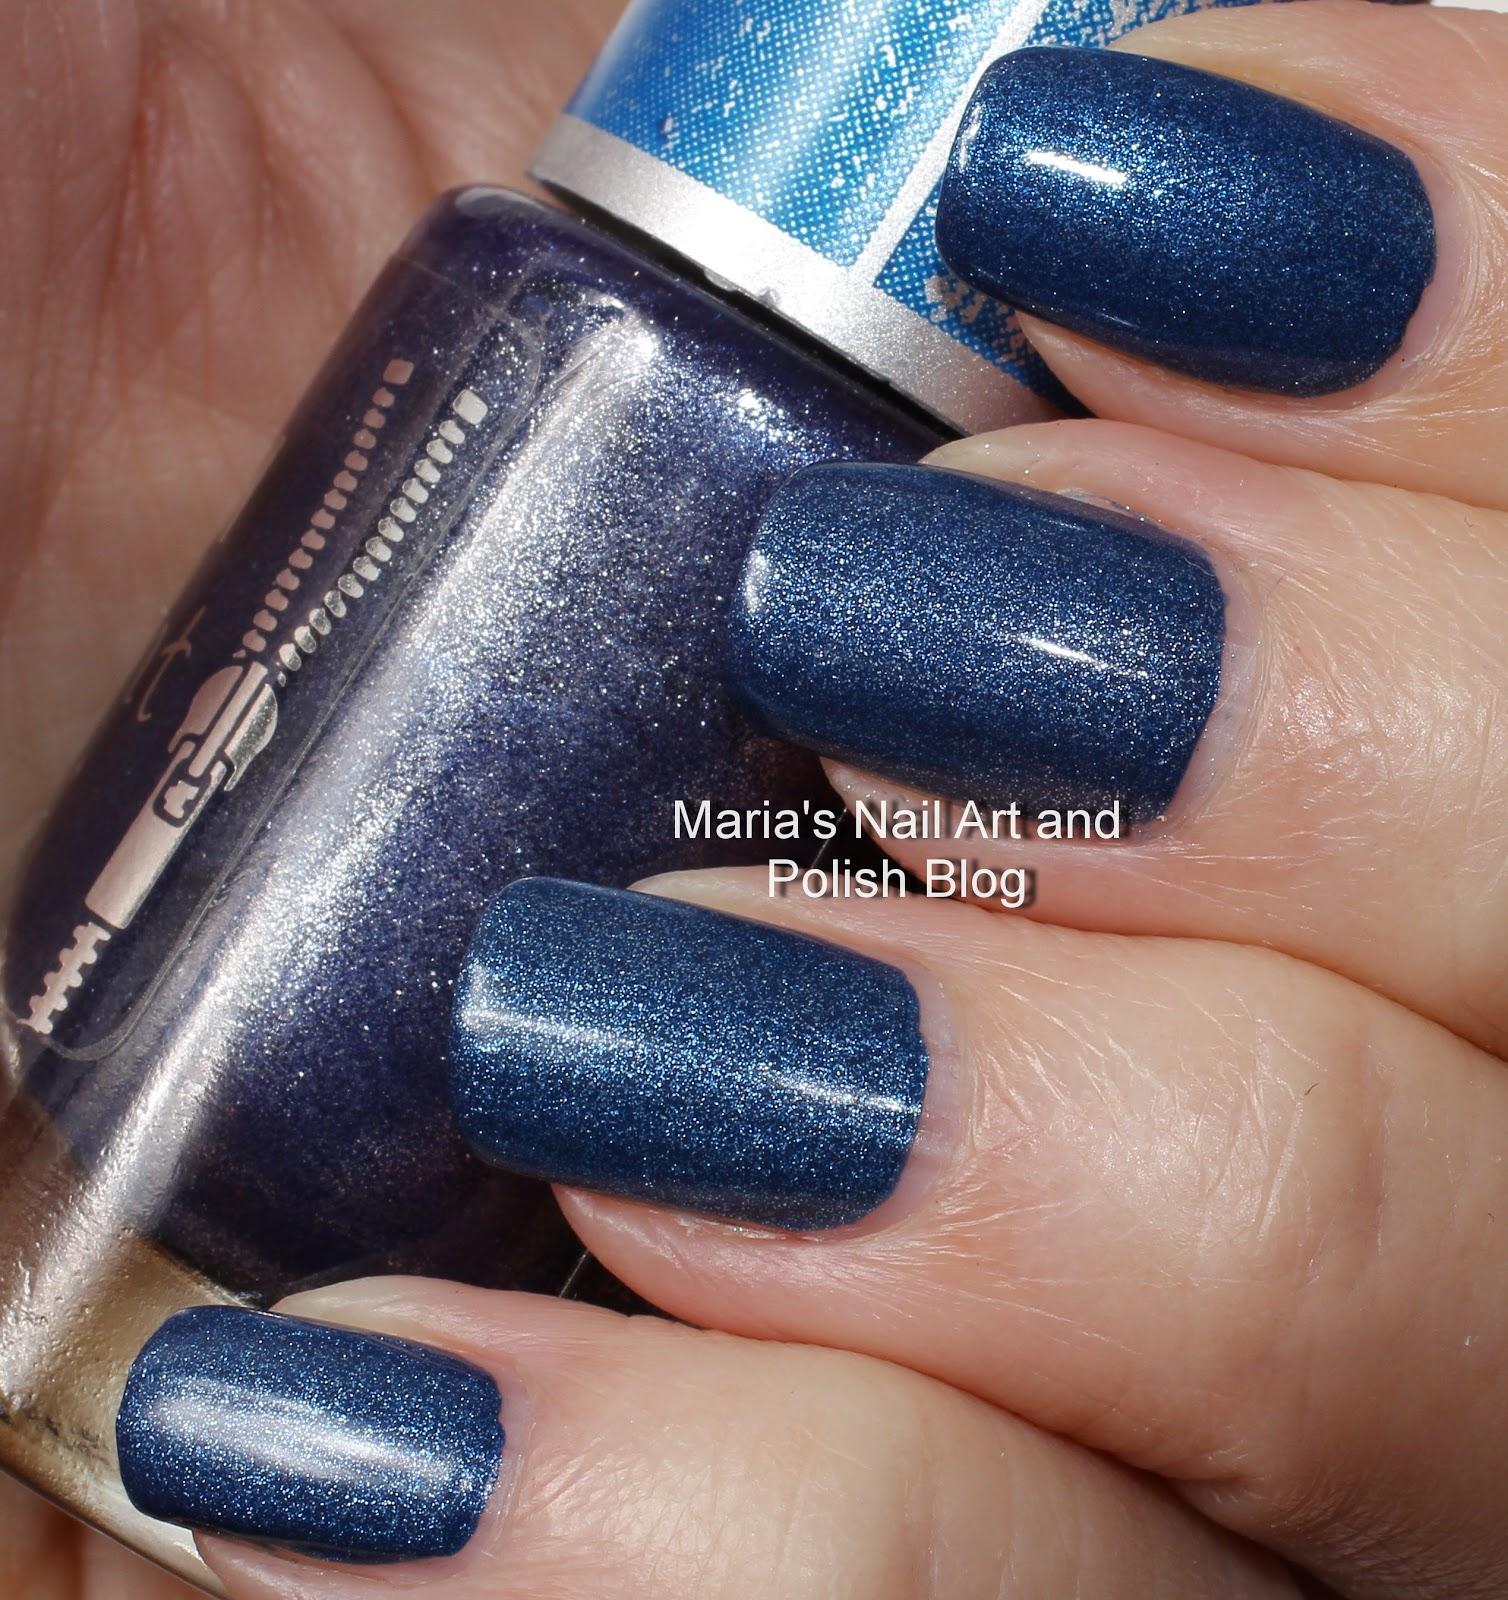 Marias Nail Art And Polish Blog: Denim Polish Comparisons